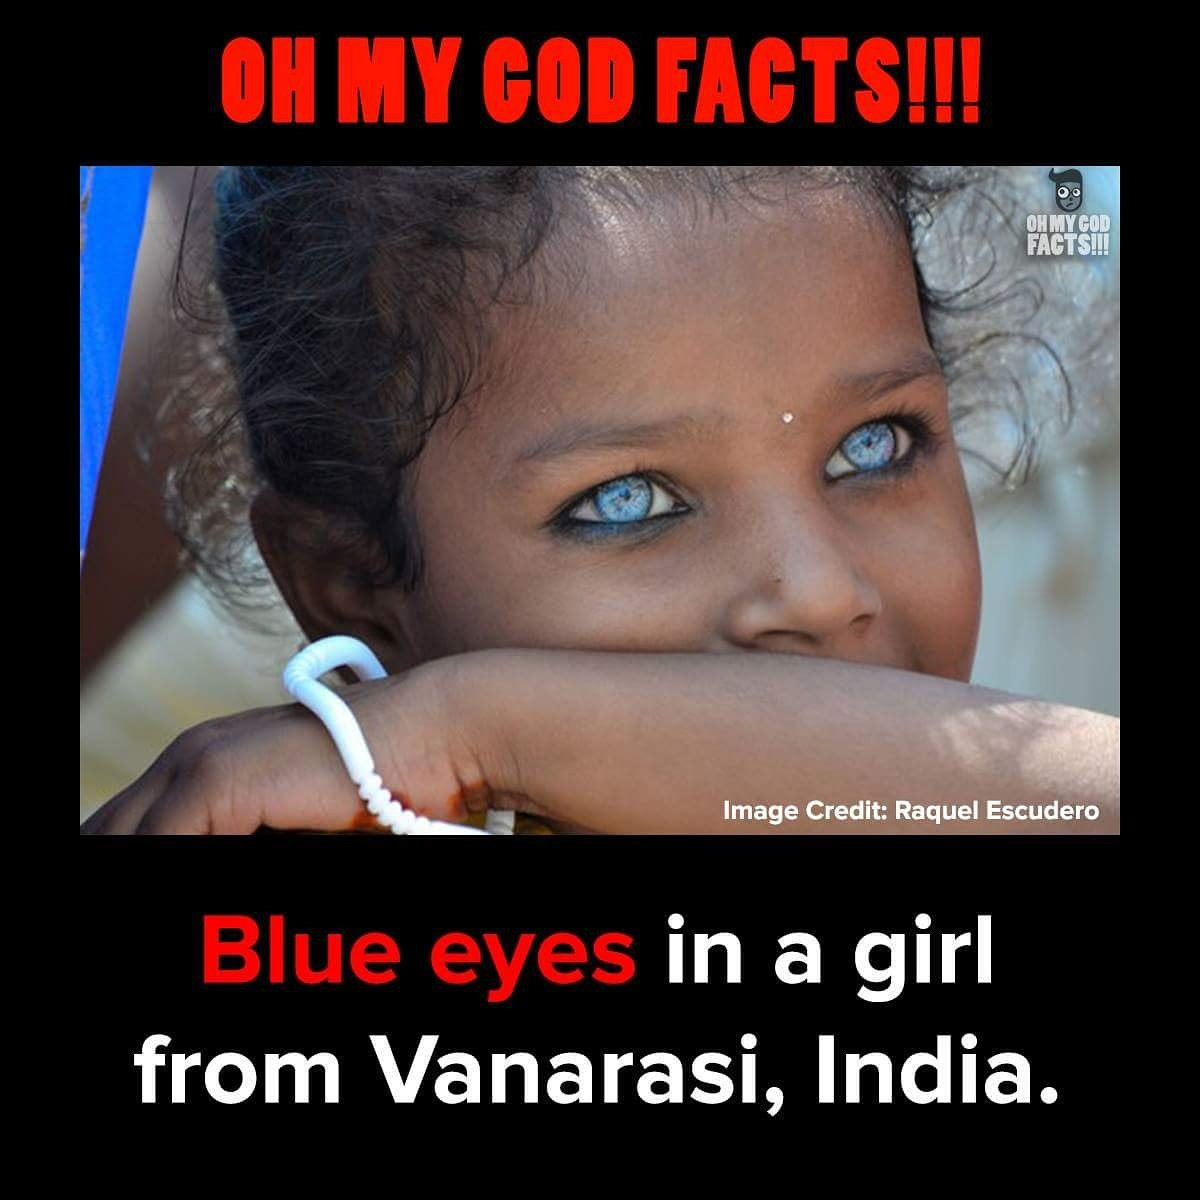 Those eyes! #Eyes <br>http://pic.twitter.com/oHtGwNFcYf